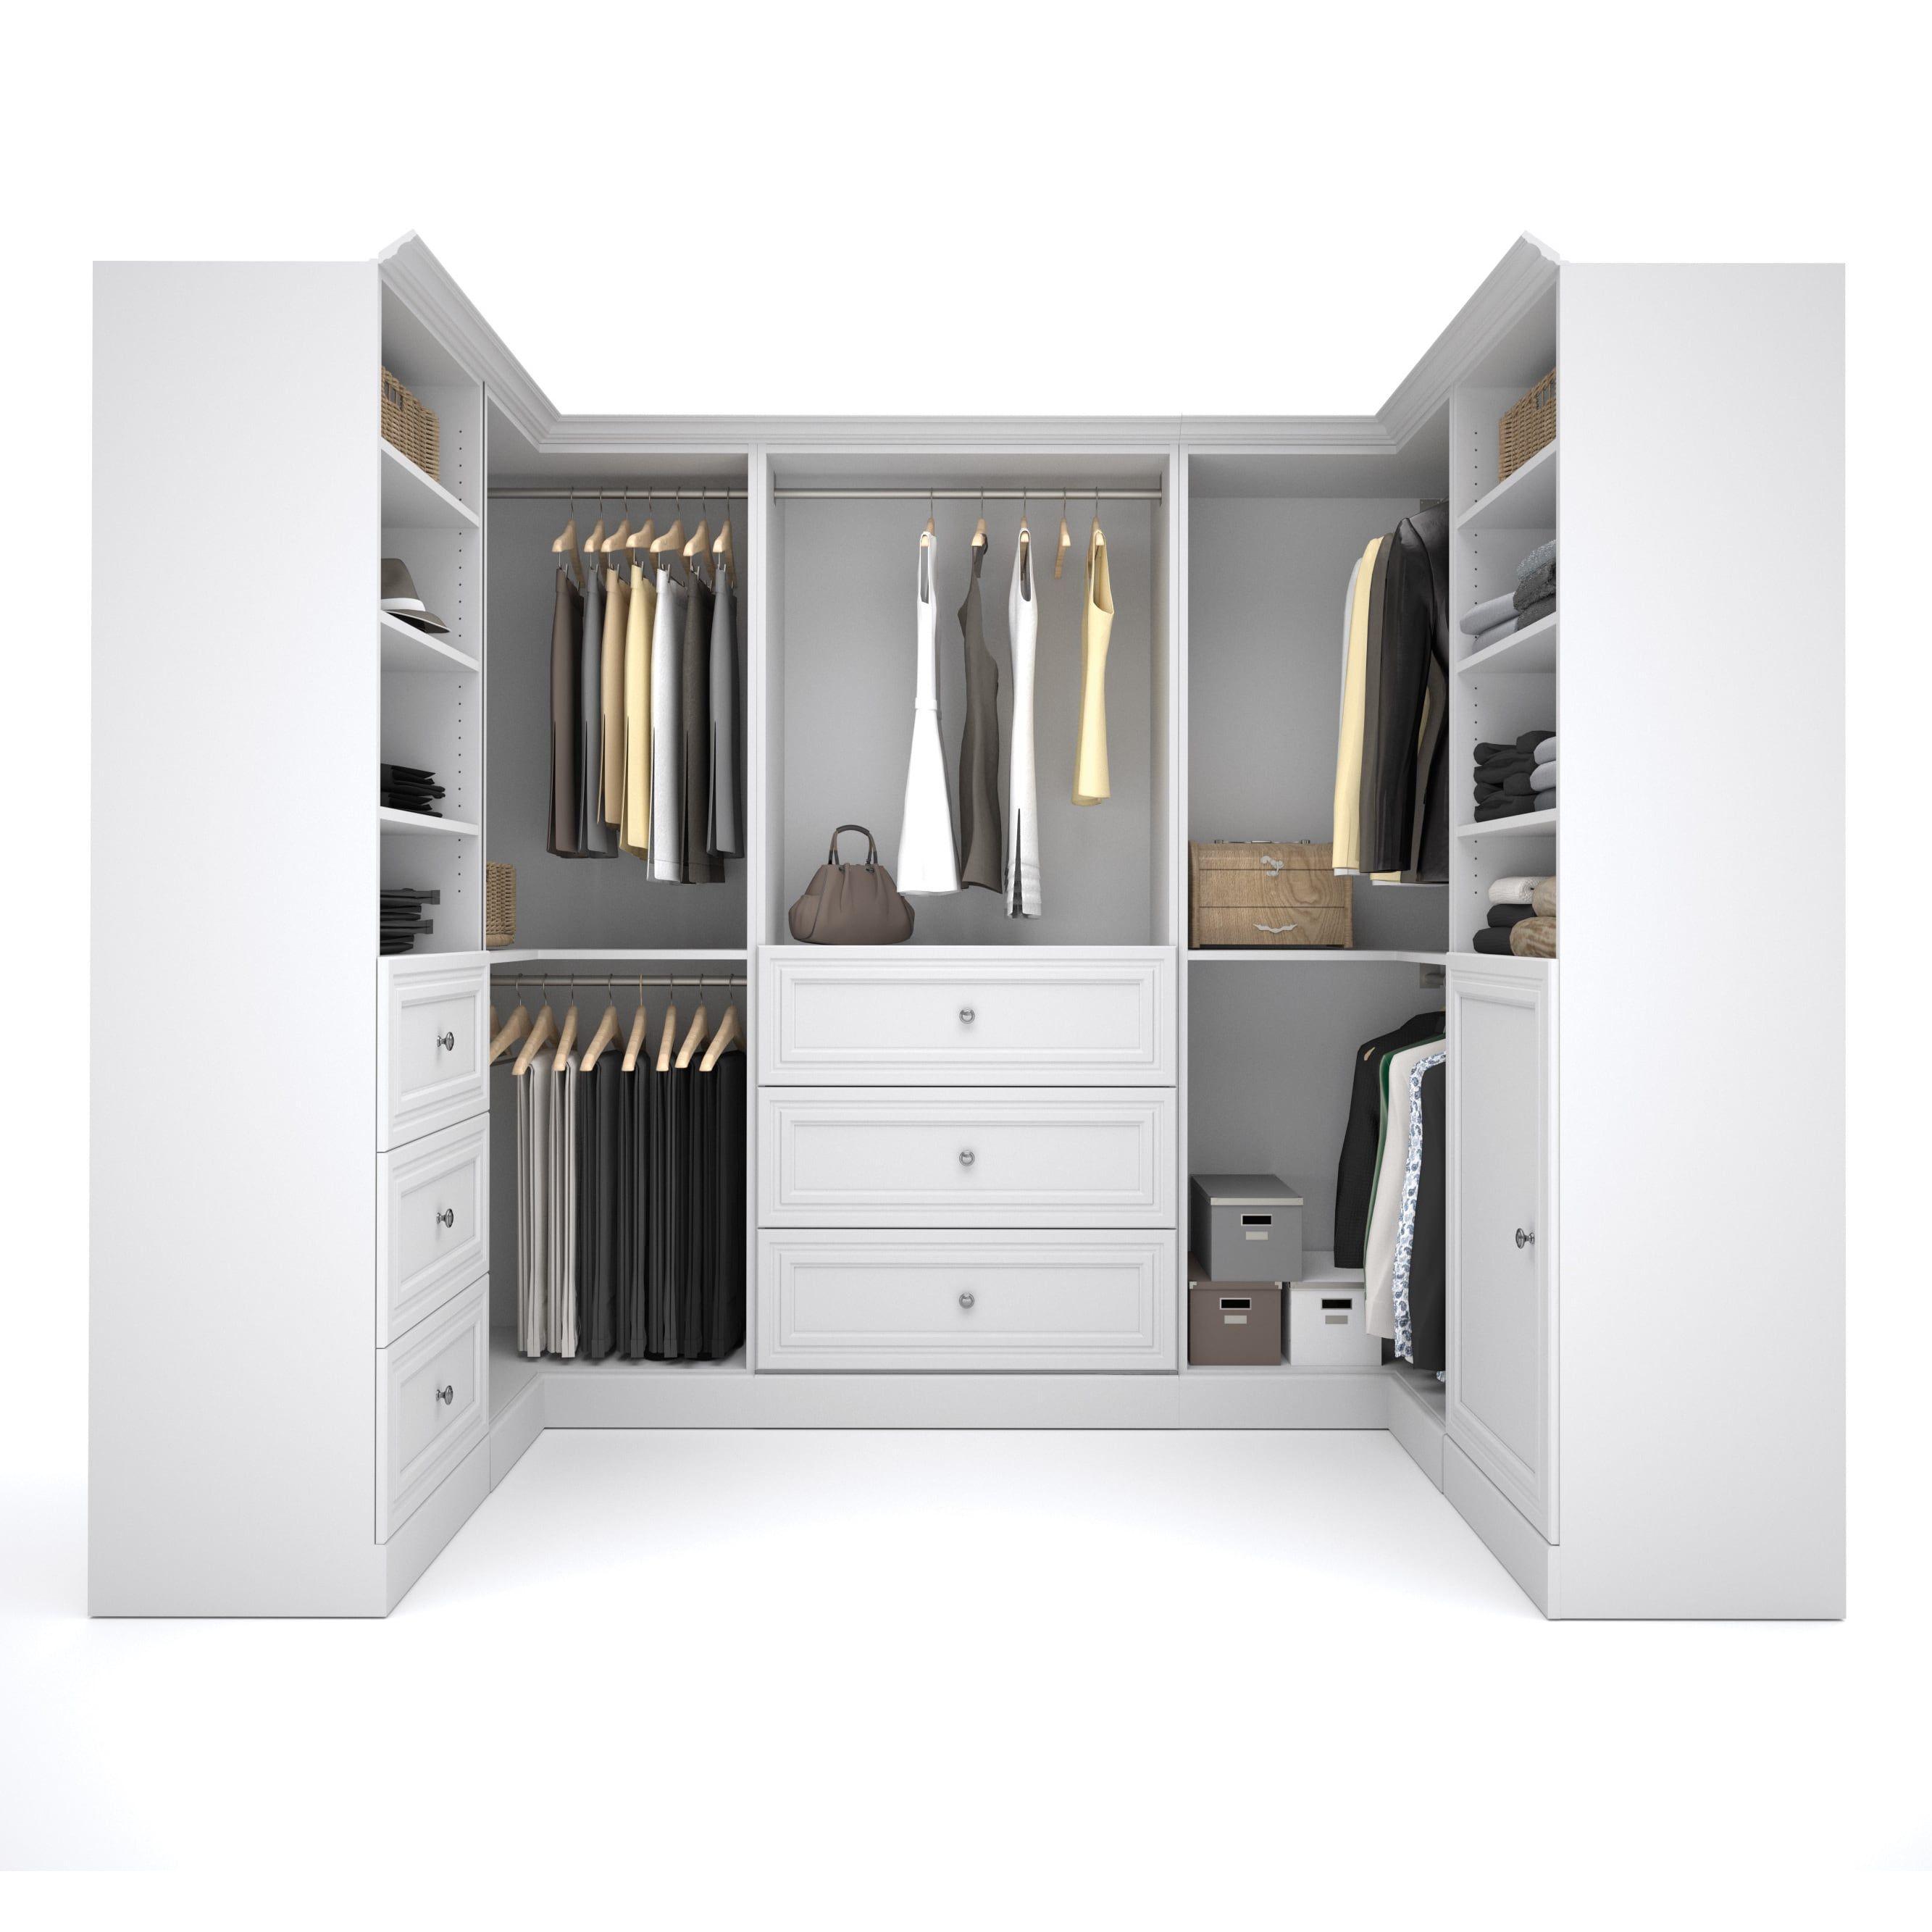 Amazon Com Prepac Elite Collection 32 Inch Storage Cabinet Utility Cabinets White Storage Cabinets Utility Storage Cabinet Storage Cabinets